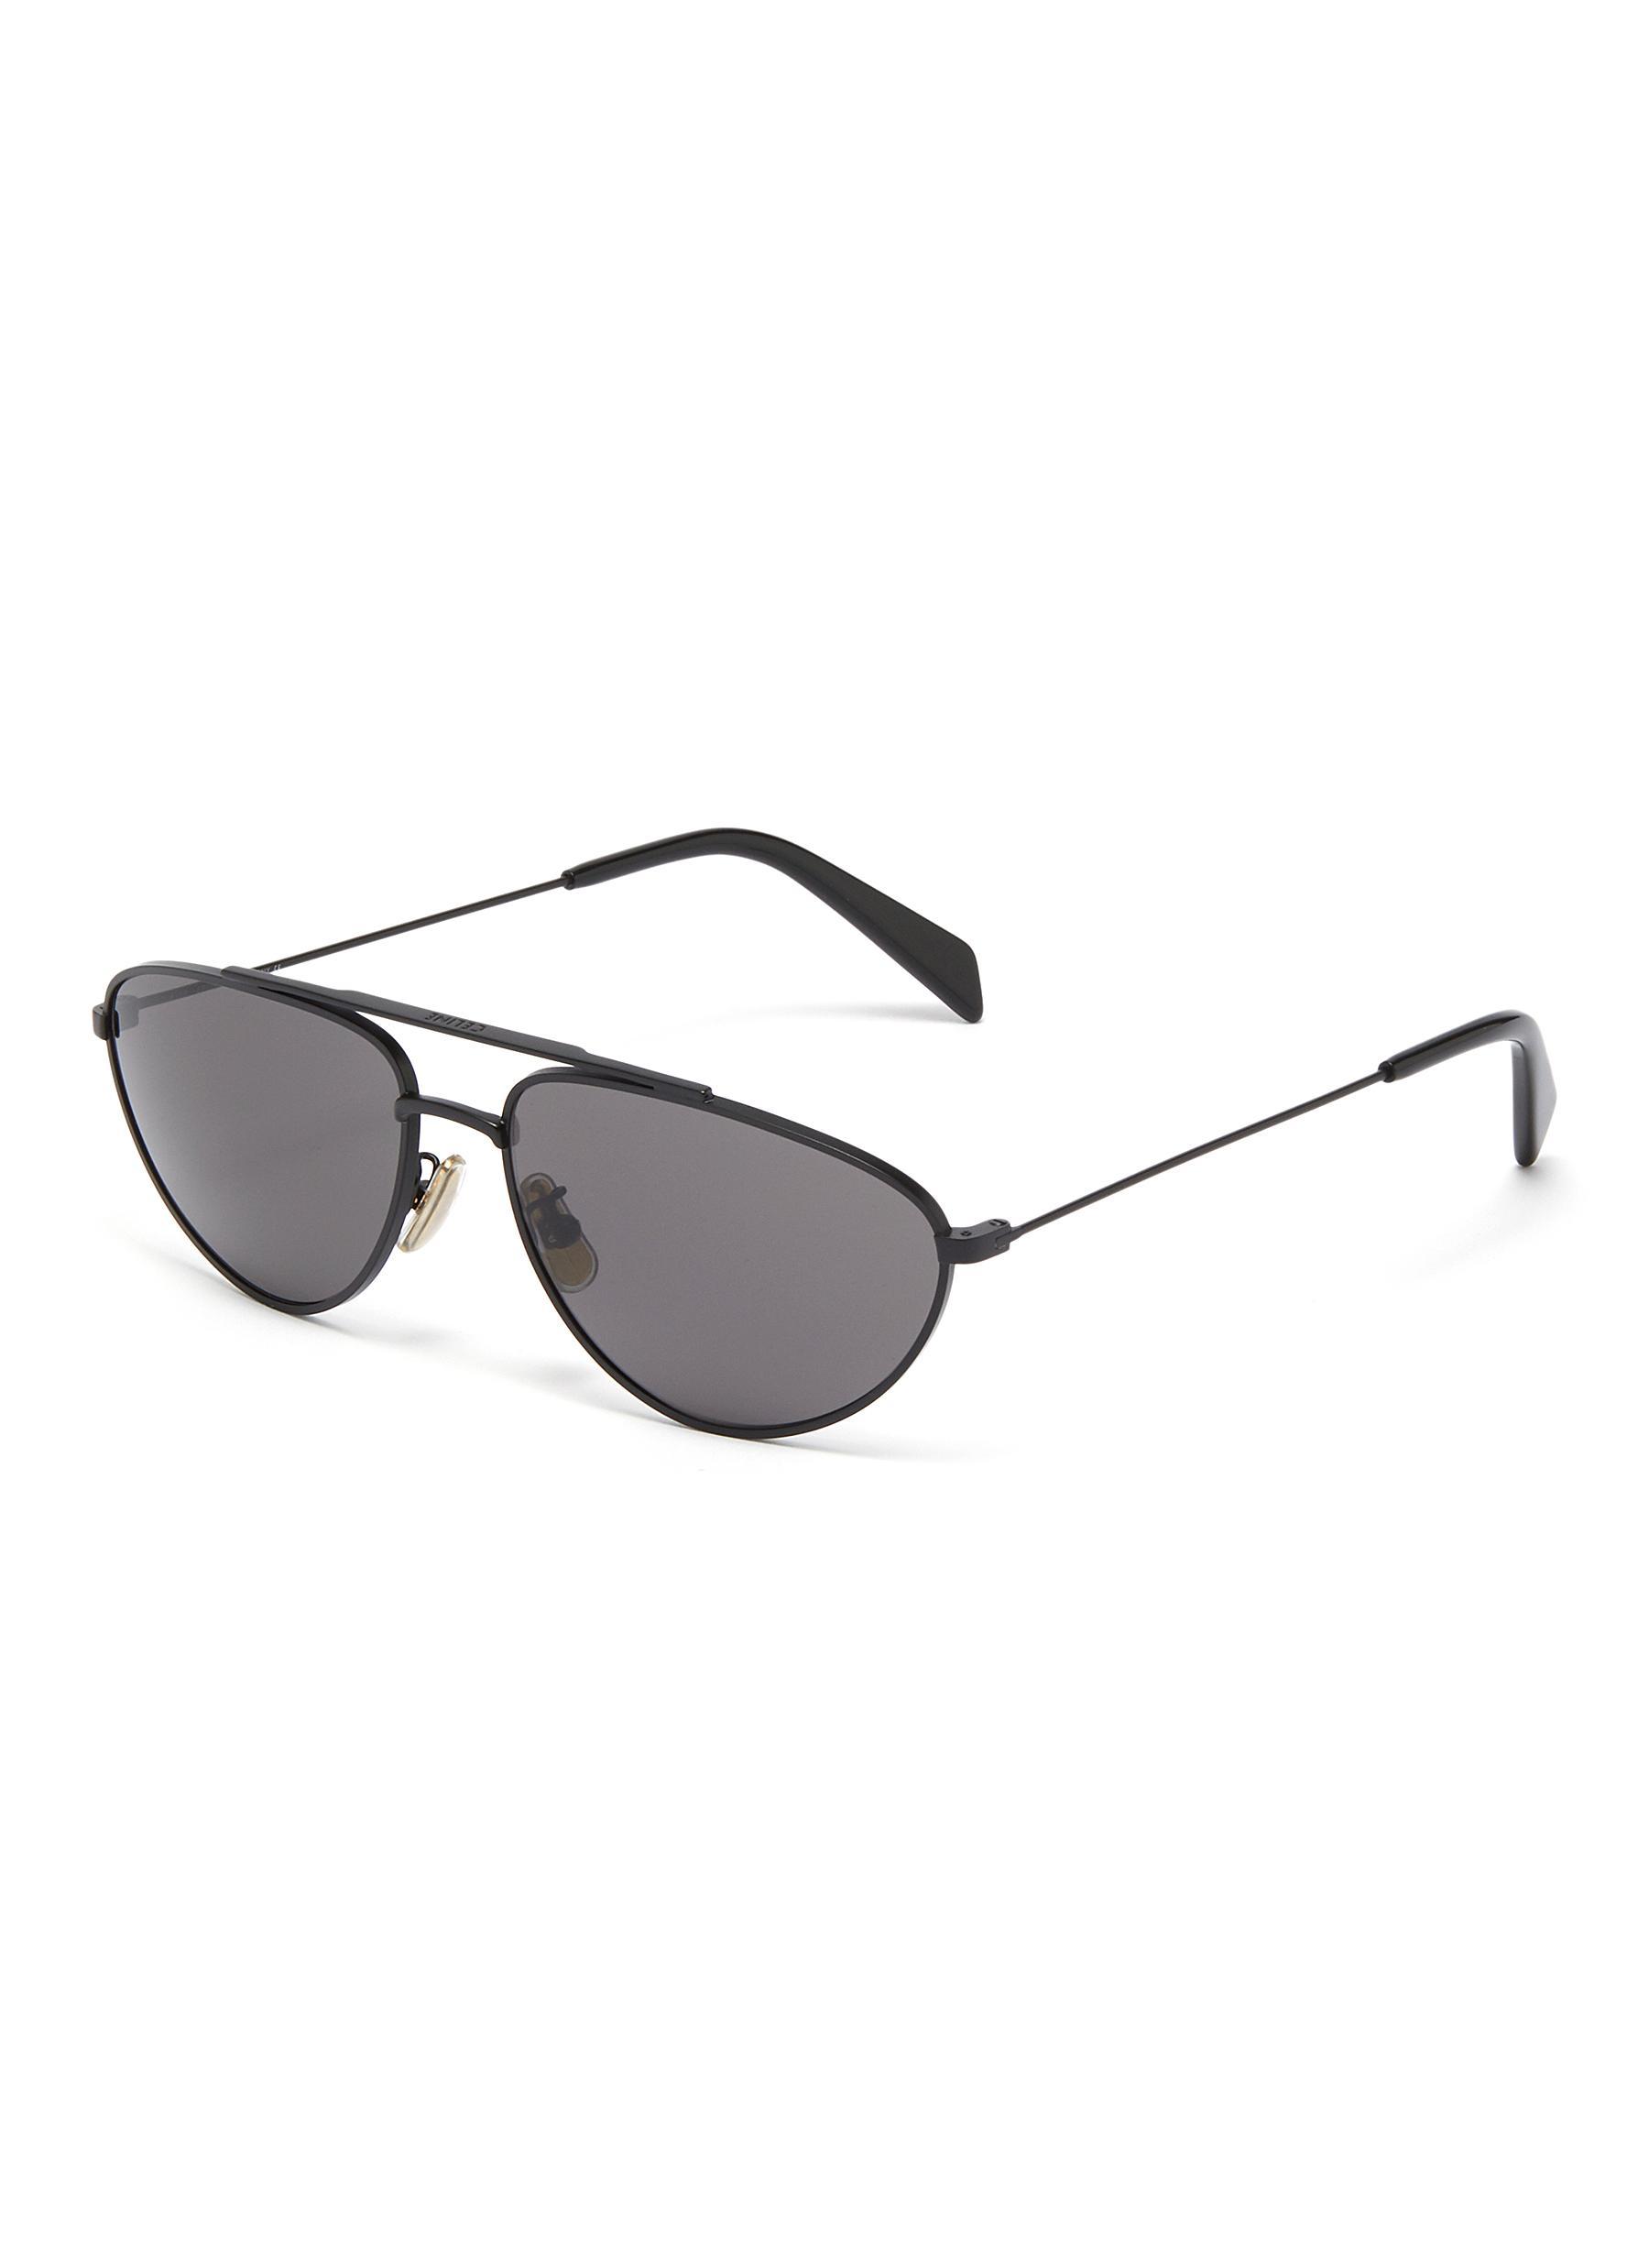 26691e5f7ad1 CELINE   Metal narrow aviator sunglasses   Men   Lane Crawford